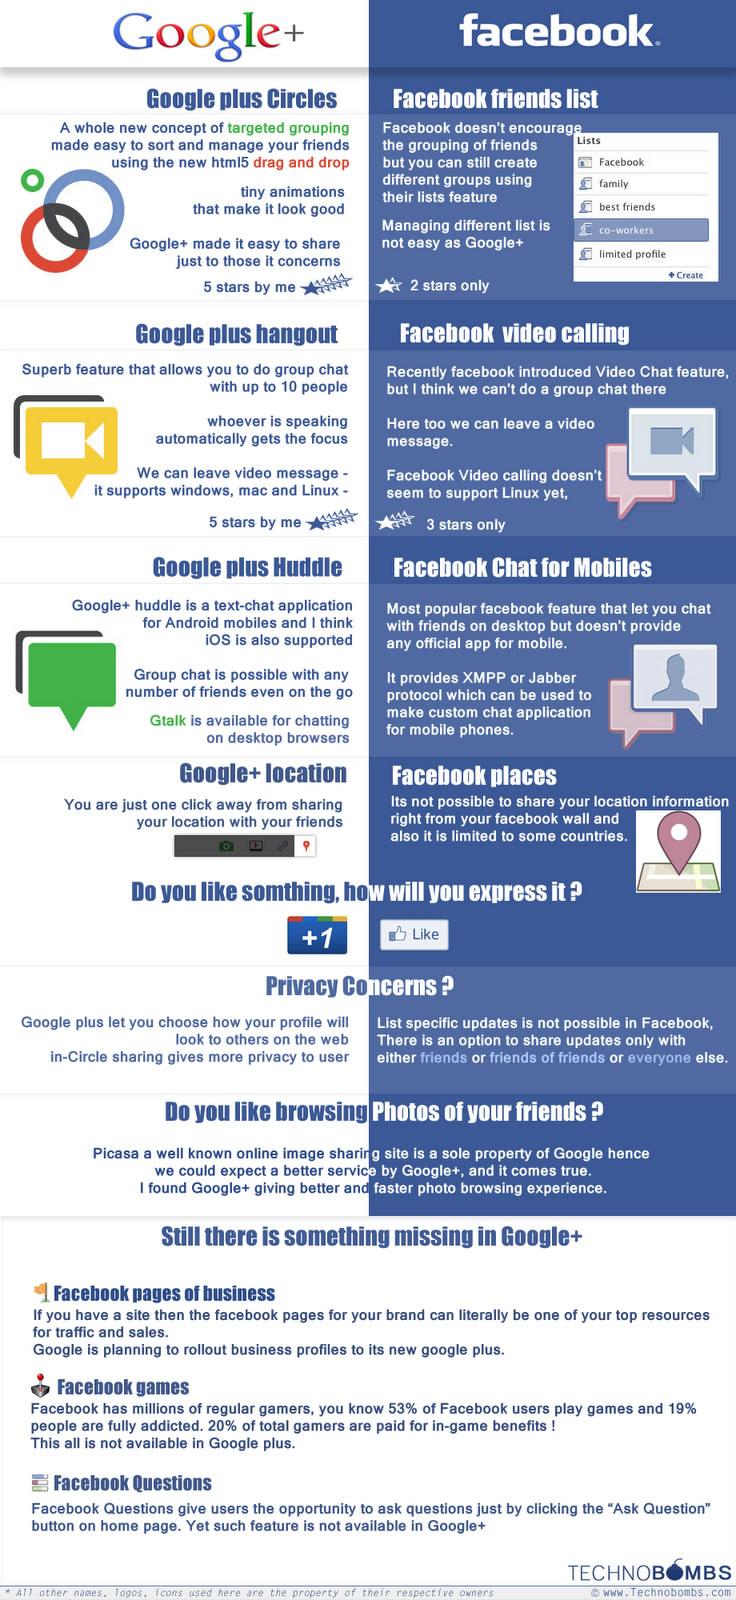 Diferencias entre facebook vs google+